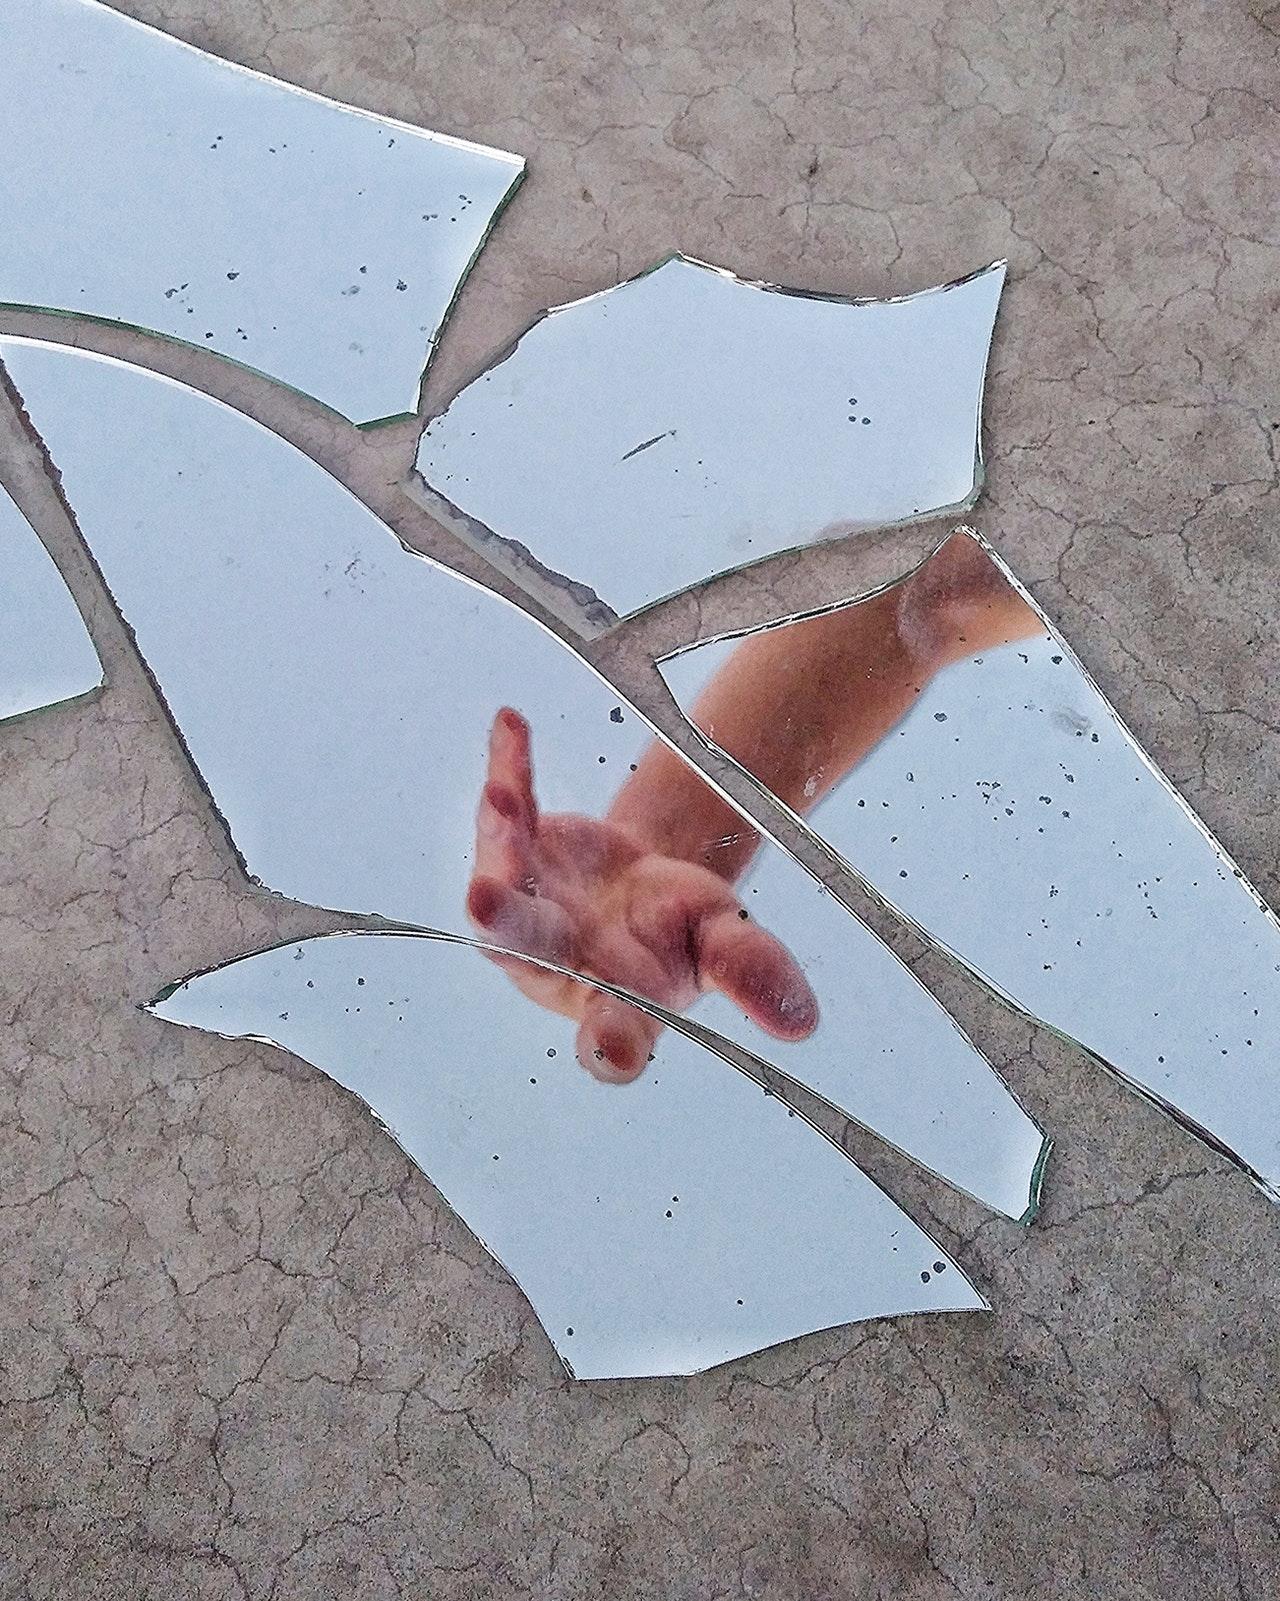 miroir brisé main amour